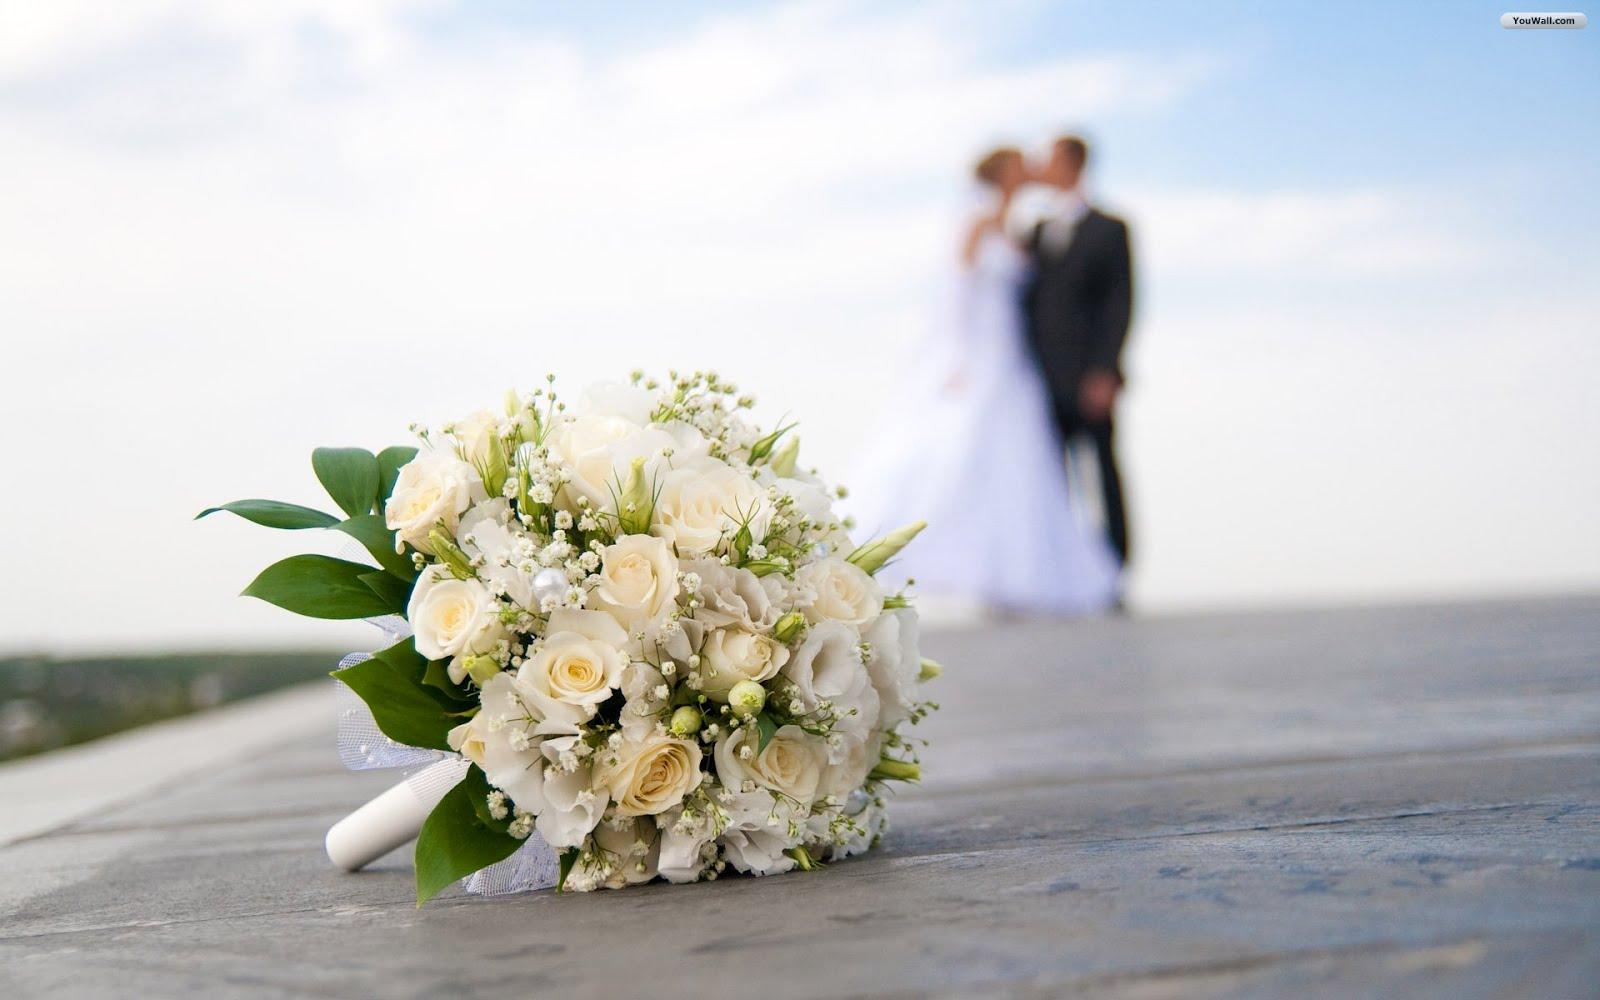 http://1.bp.blogspot.com/-SYeV-9uY_rk/UDLAVRIrt2I/AAAAAAAAd0M/onVFIJu9rdI/s1600/wedding_wallpaper_09d95.jpg